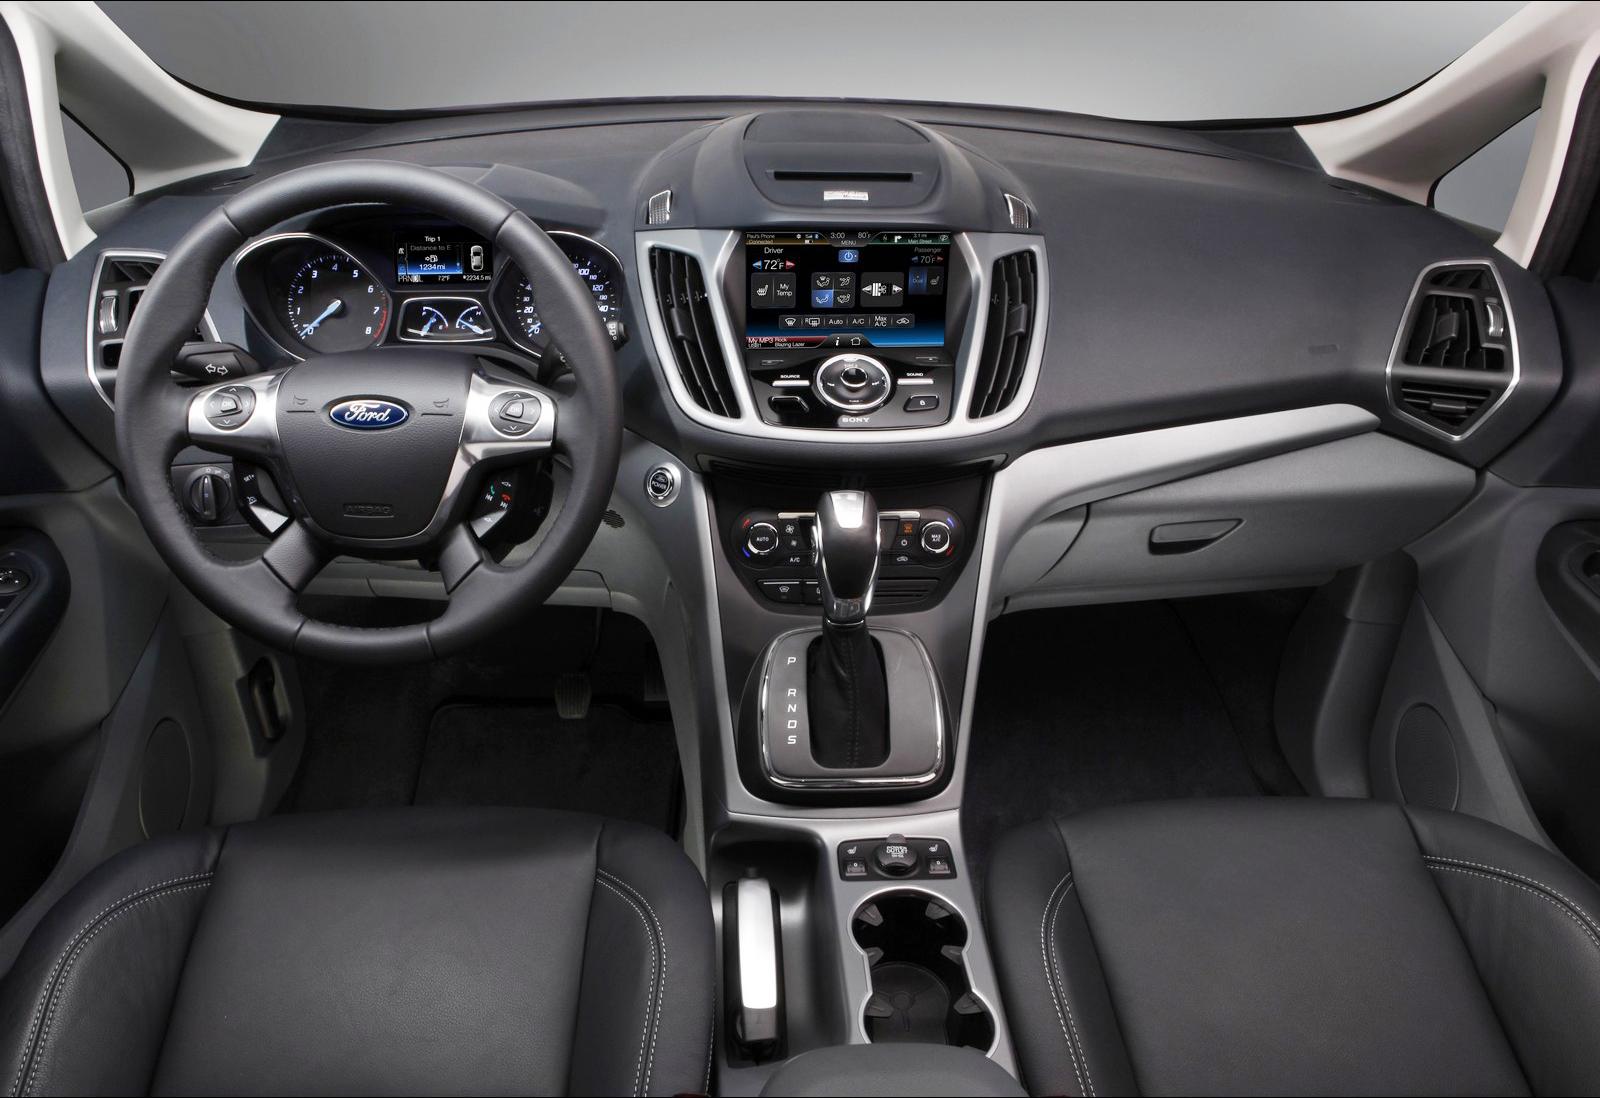 Ford C-Max Interior Image